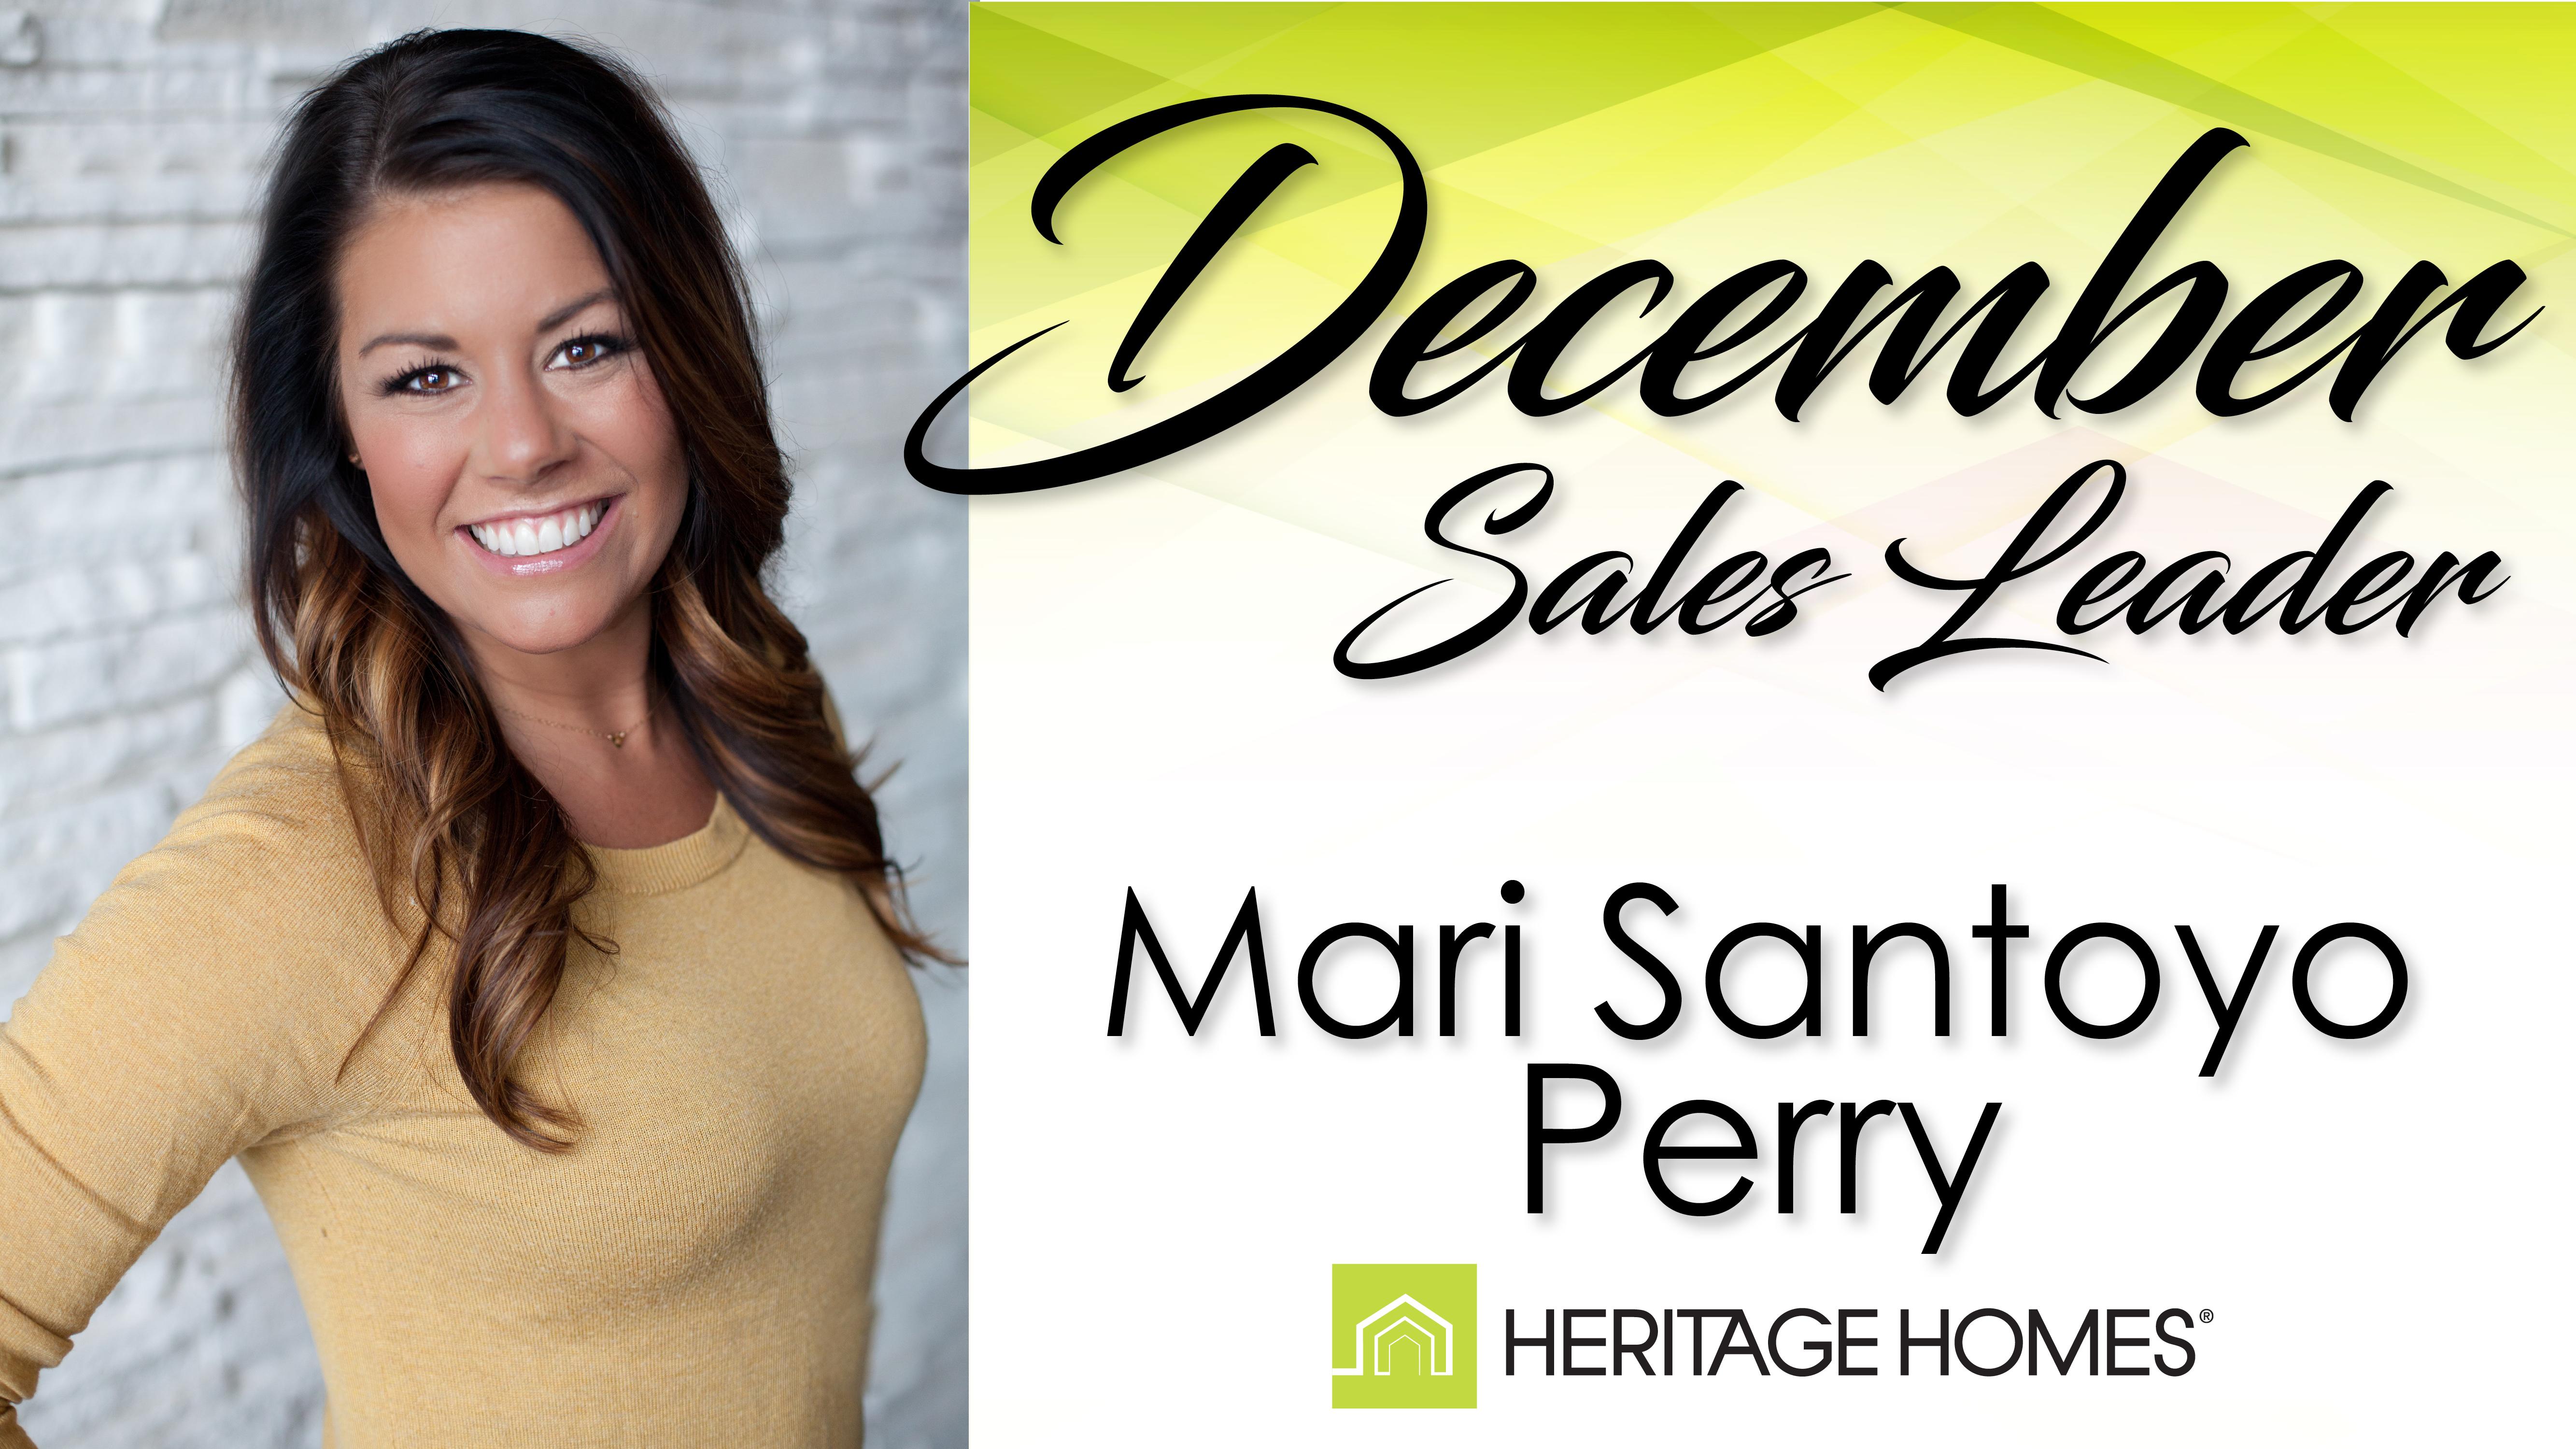 December Sales Leader – Mari Santoyo Perry